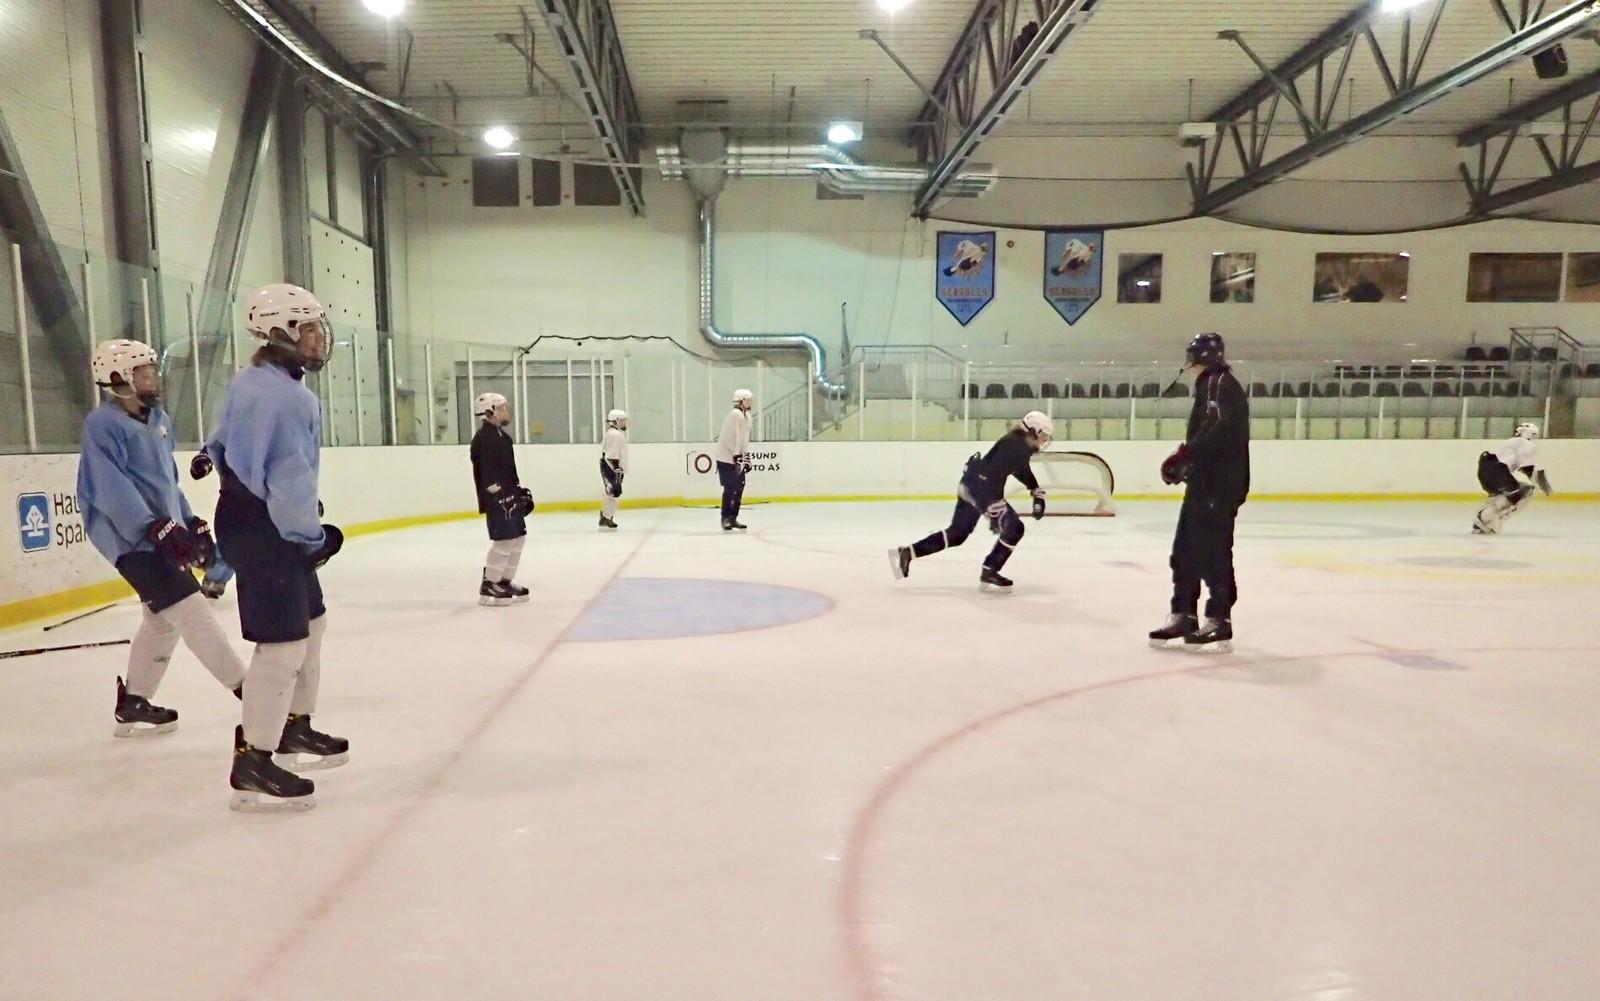 Haugesund ishockeyklubb